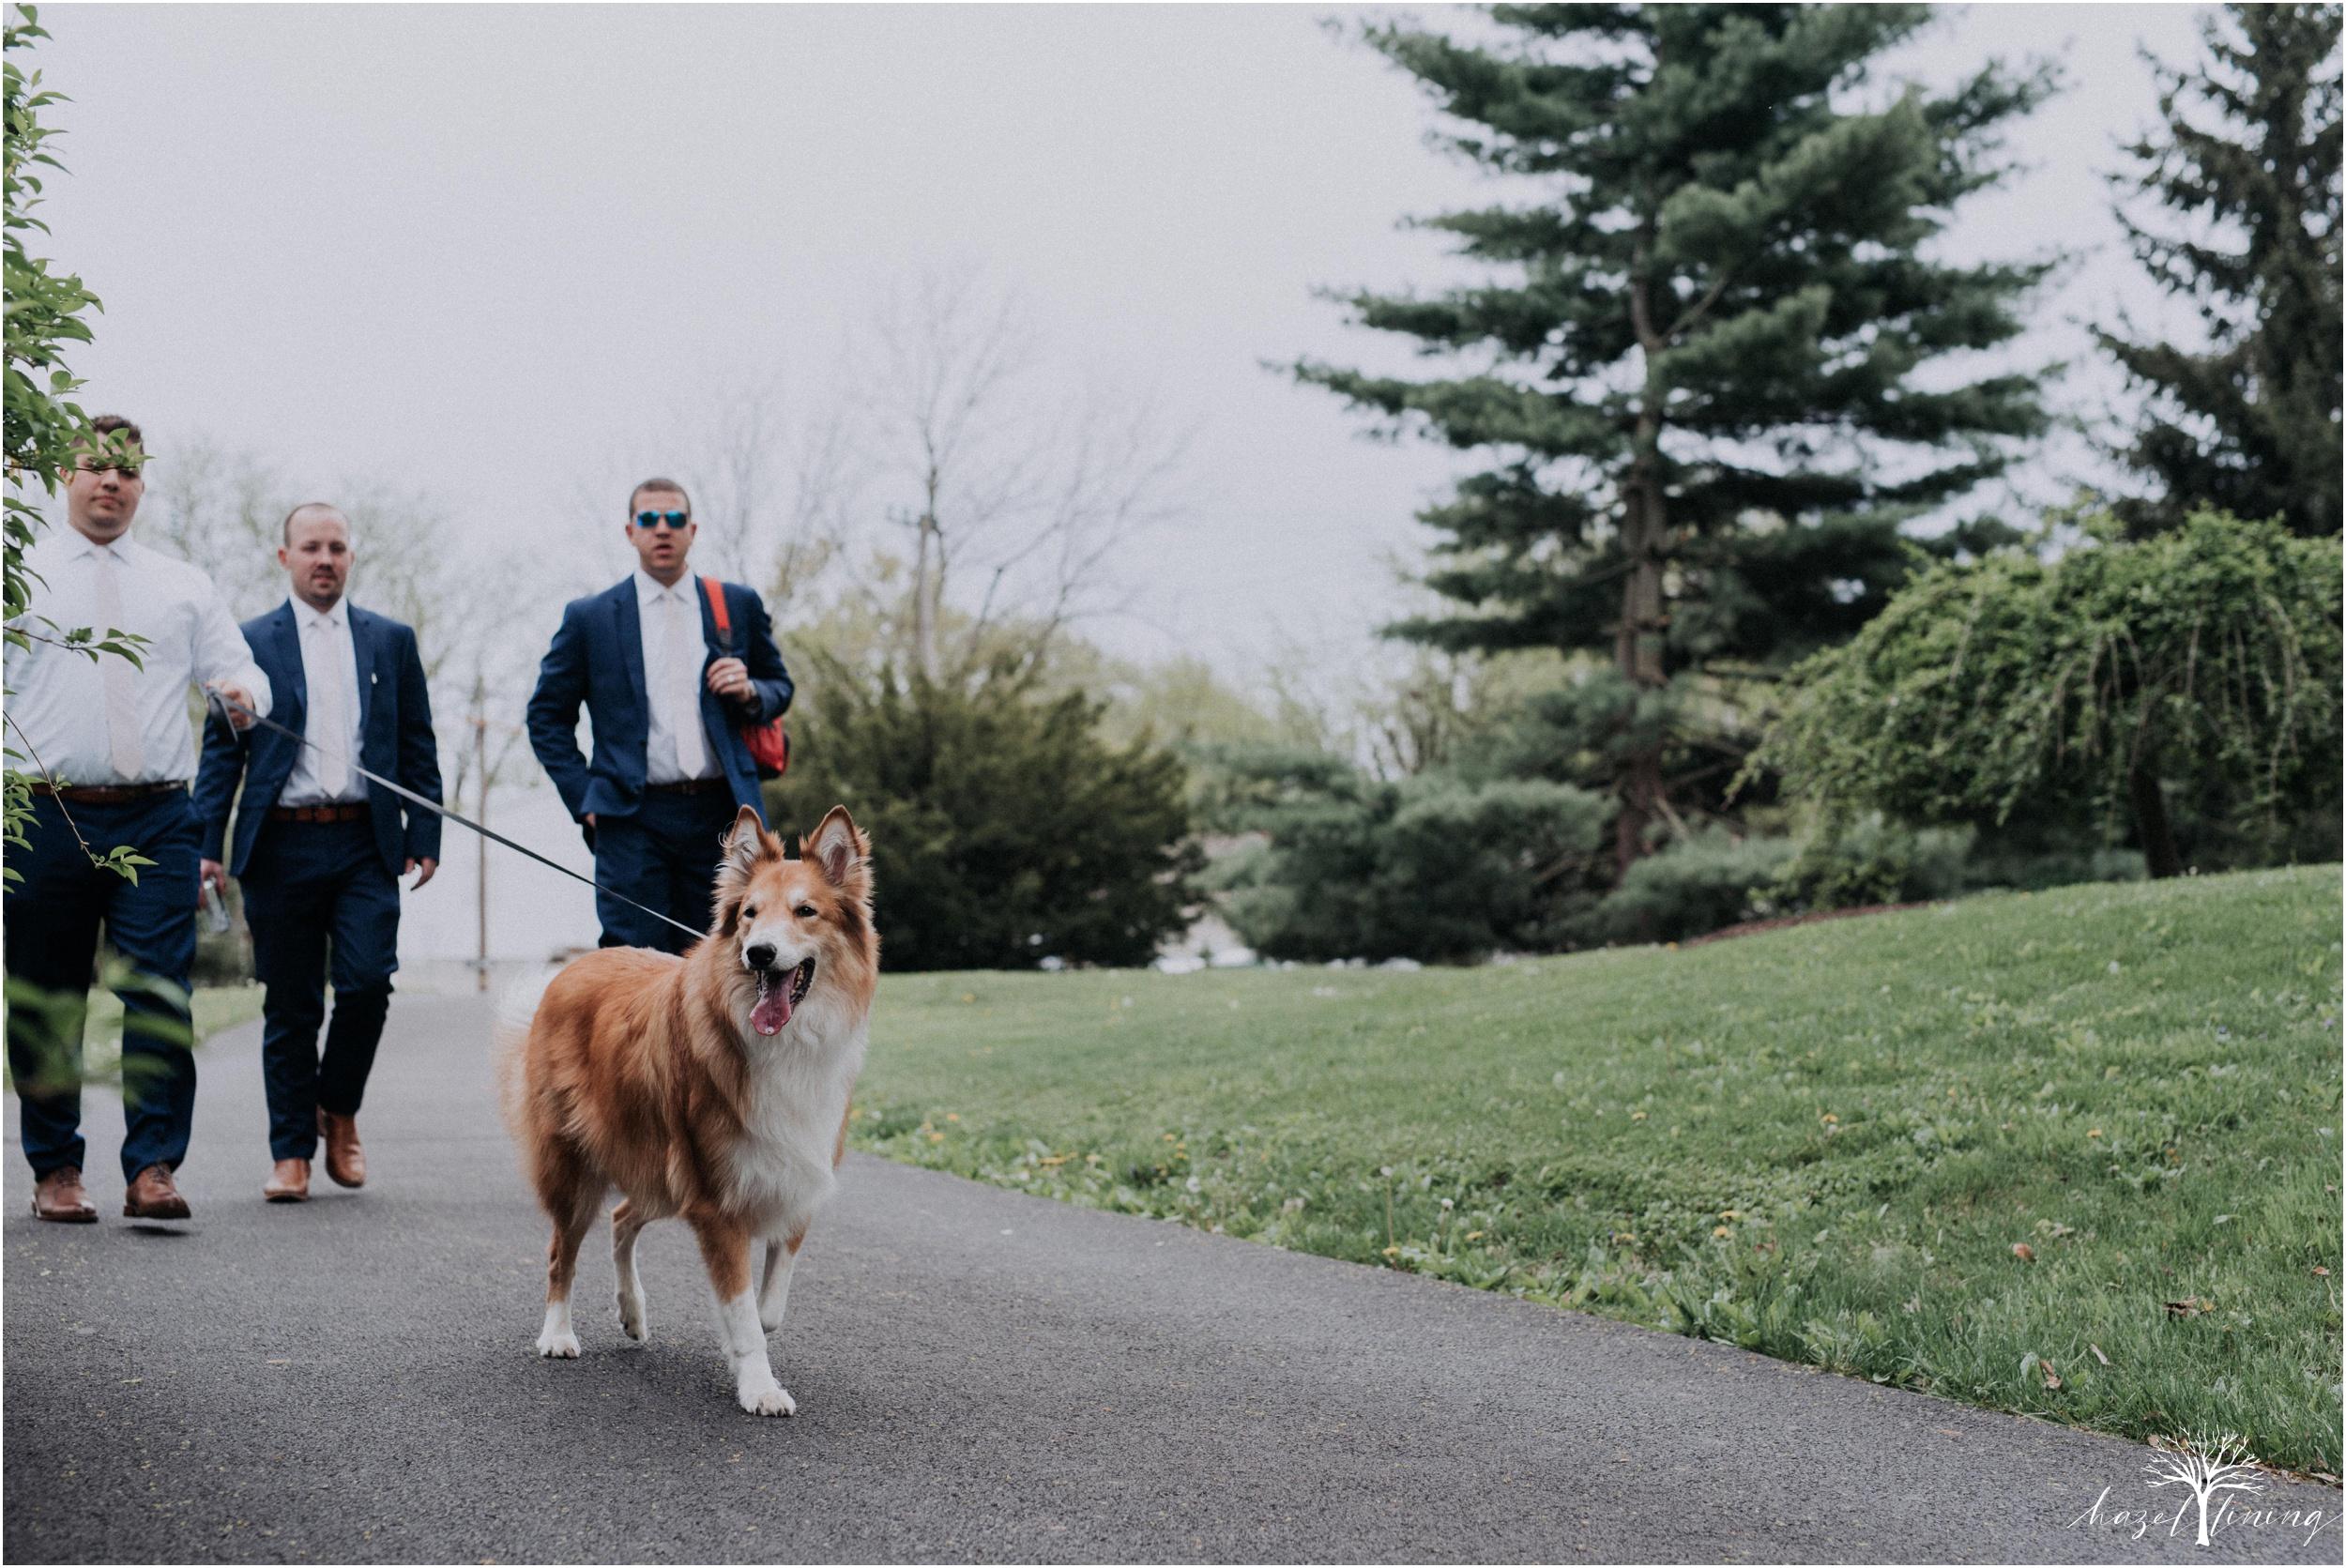 hazel-lining-travel-wedding-elopement-photography-abby-skyler-hunt-the-willis-house-york-pennsylvania-outdoor-estate-wedding_0043.jpg